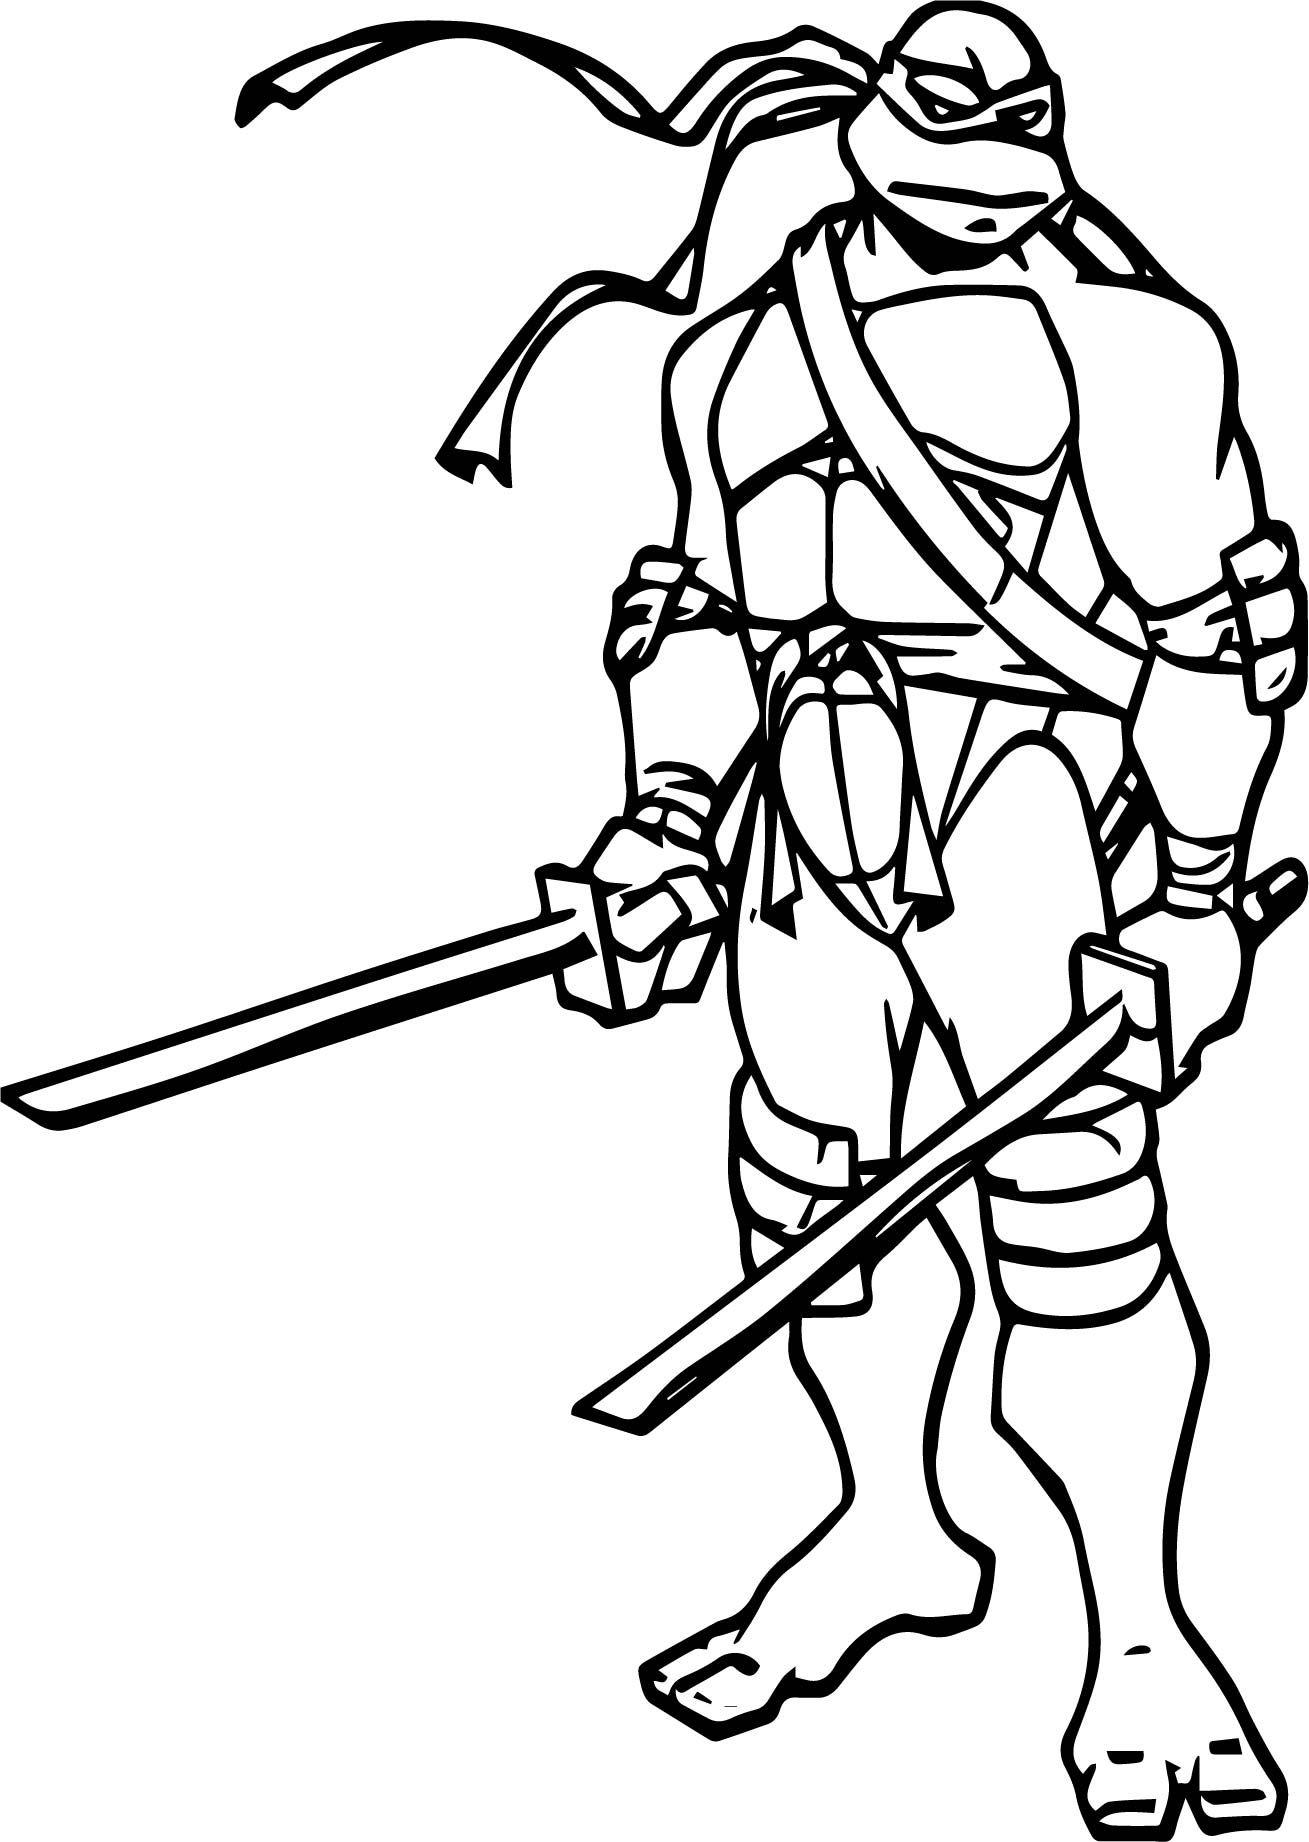 Ninja Turtle Two Blade Leonardo Coloring Page Wecoloringpage